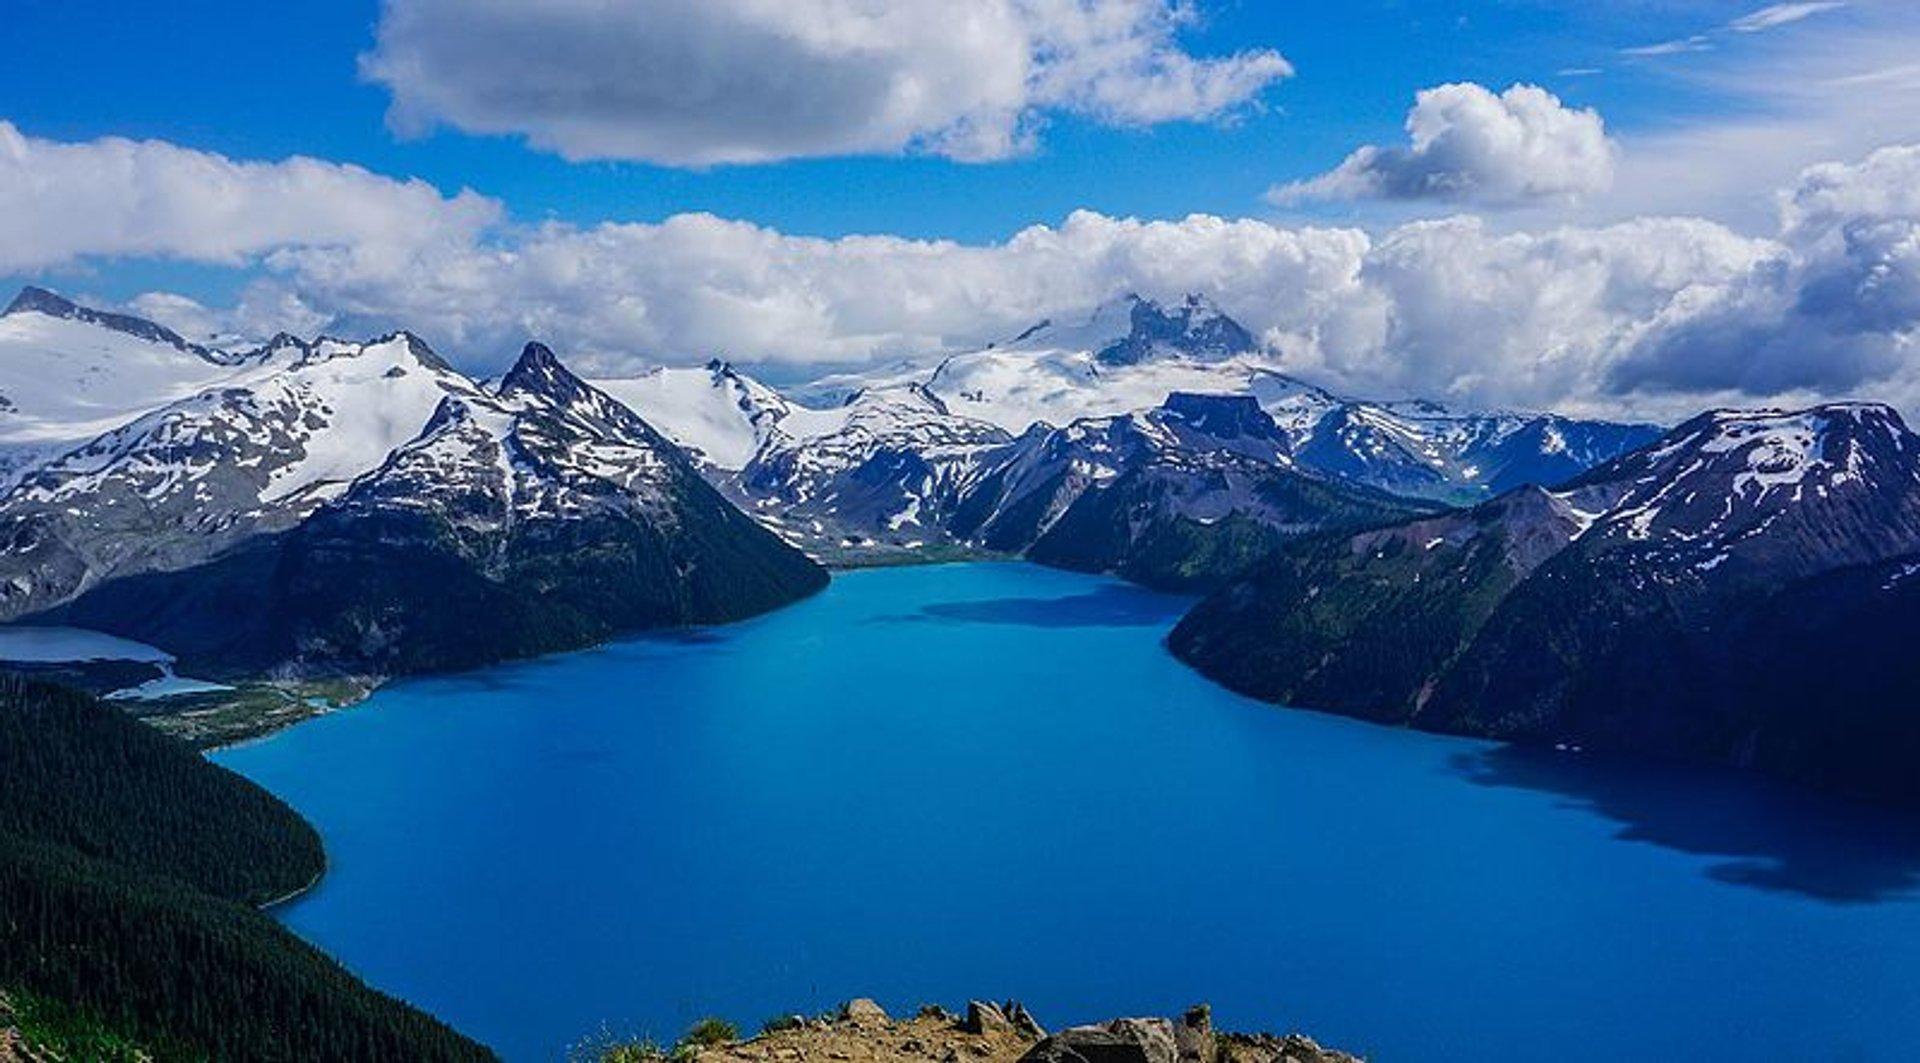 Panorama Ridge Hike in British Columbia 2020 - Best Time